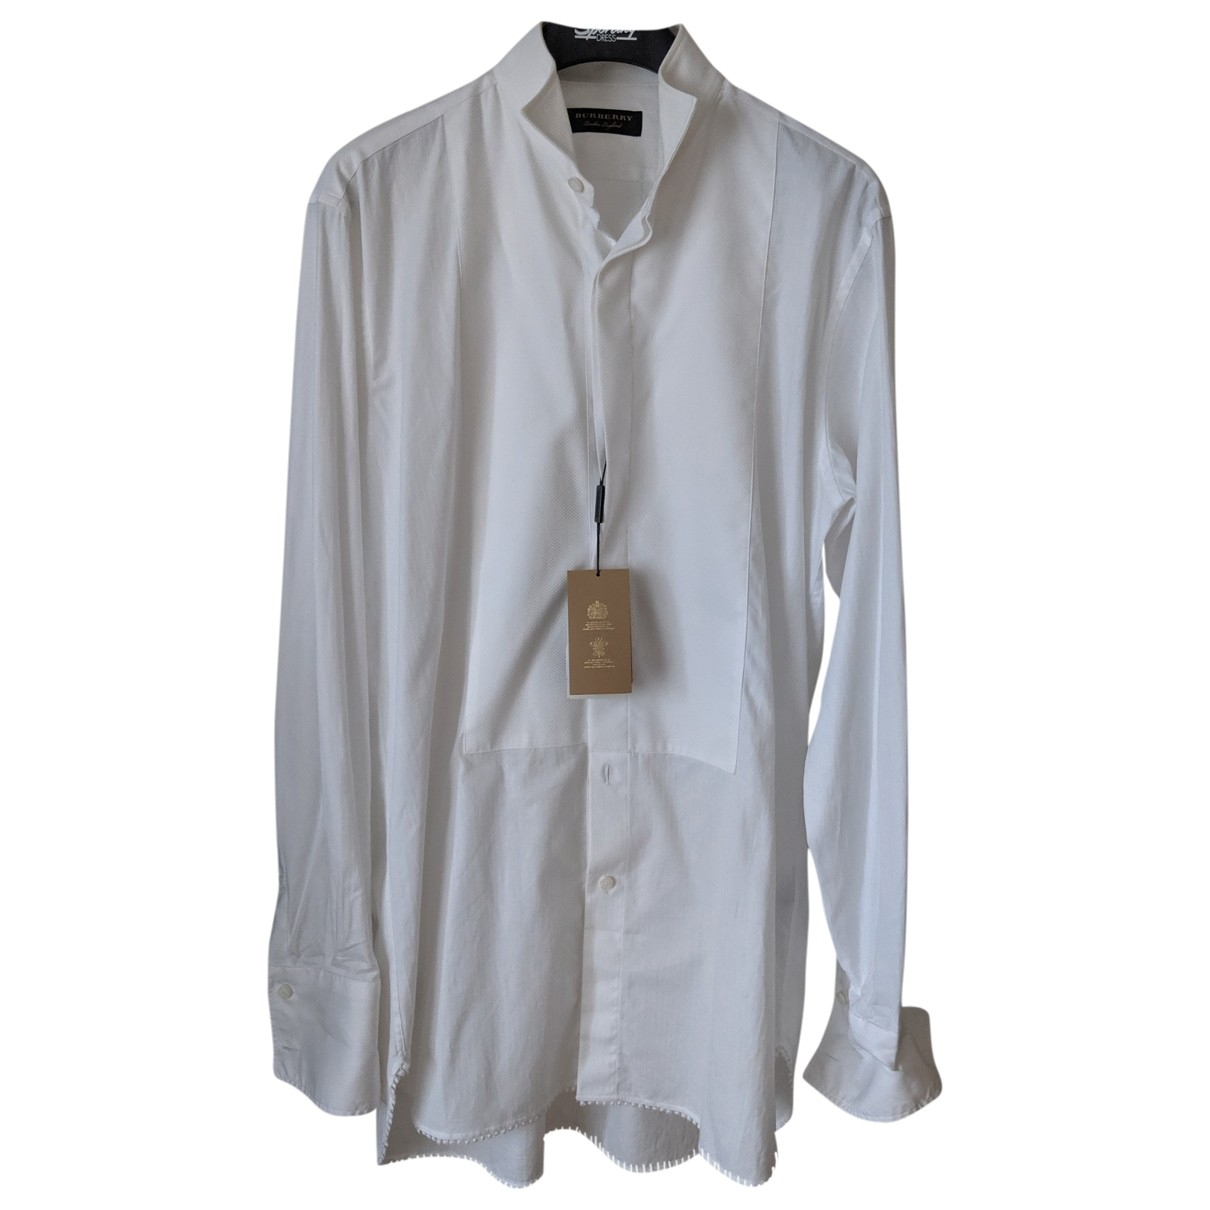 Burberry \N White Cotton Shirts for Men 15.5 UK - US (tour de cou / collar)